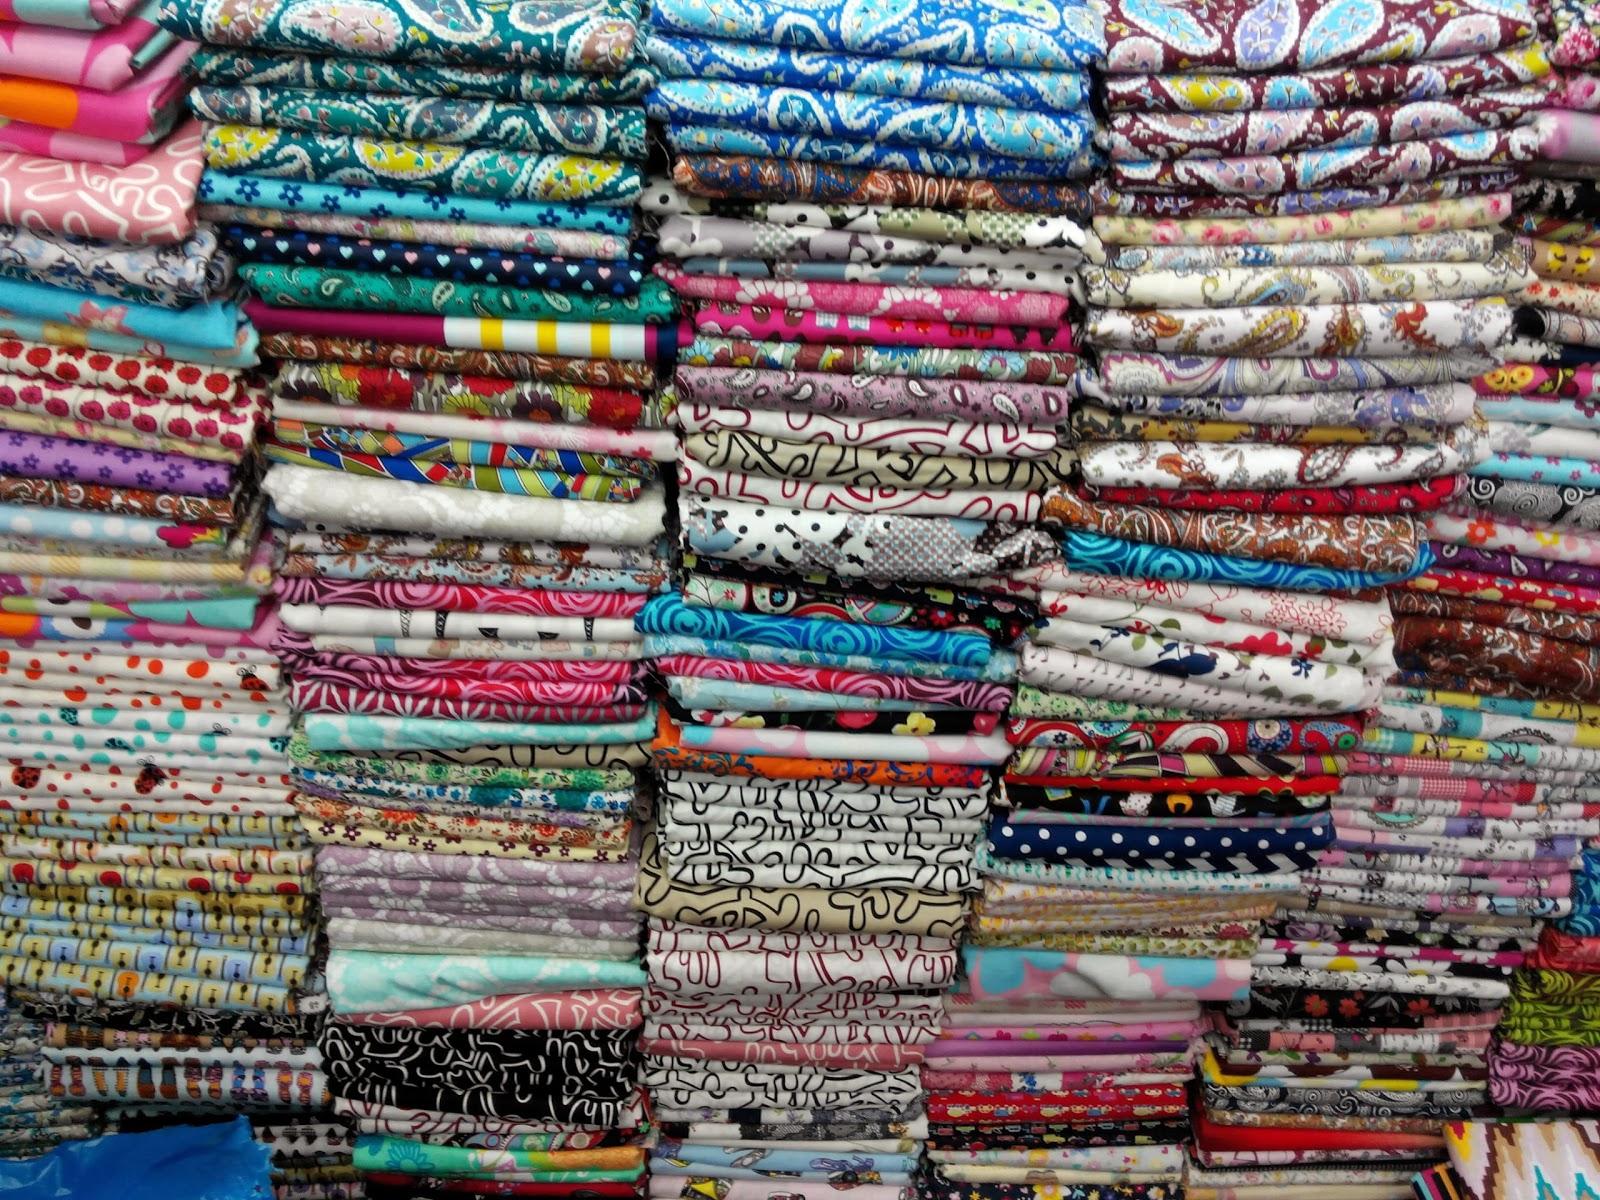 Cotton Jepun Borong Kain Cotton Jepun Terbaru